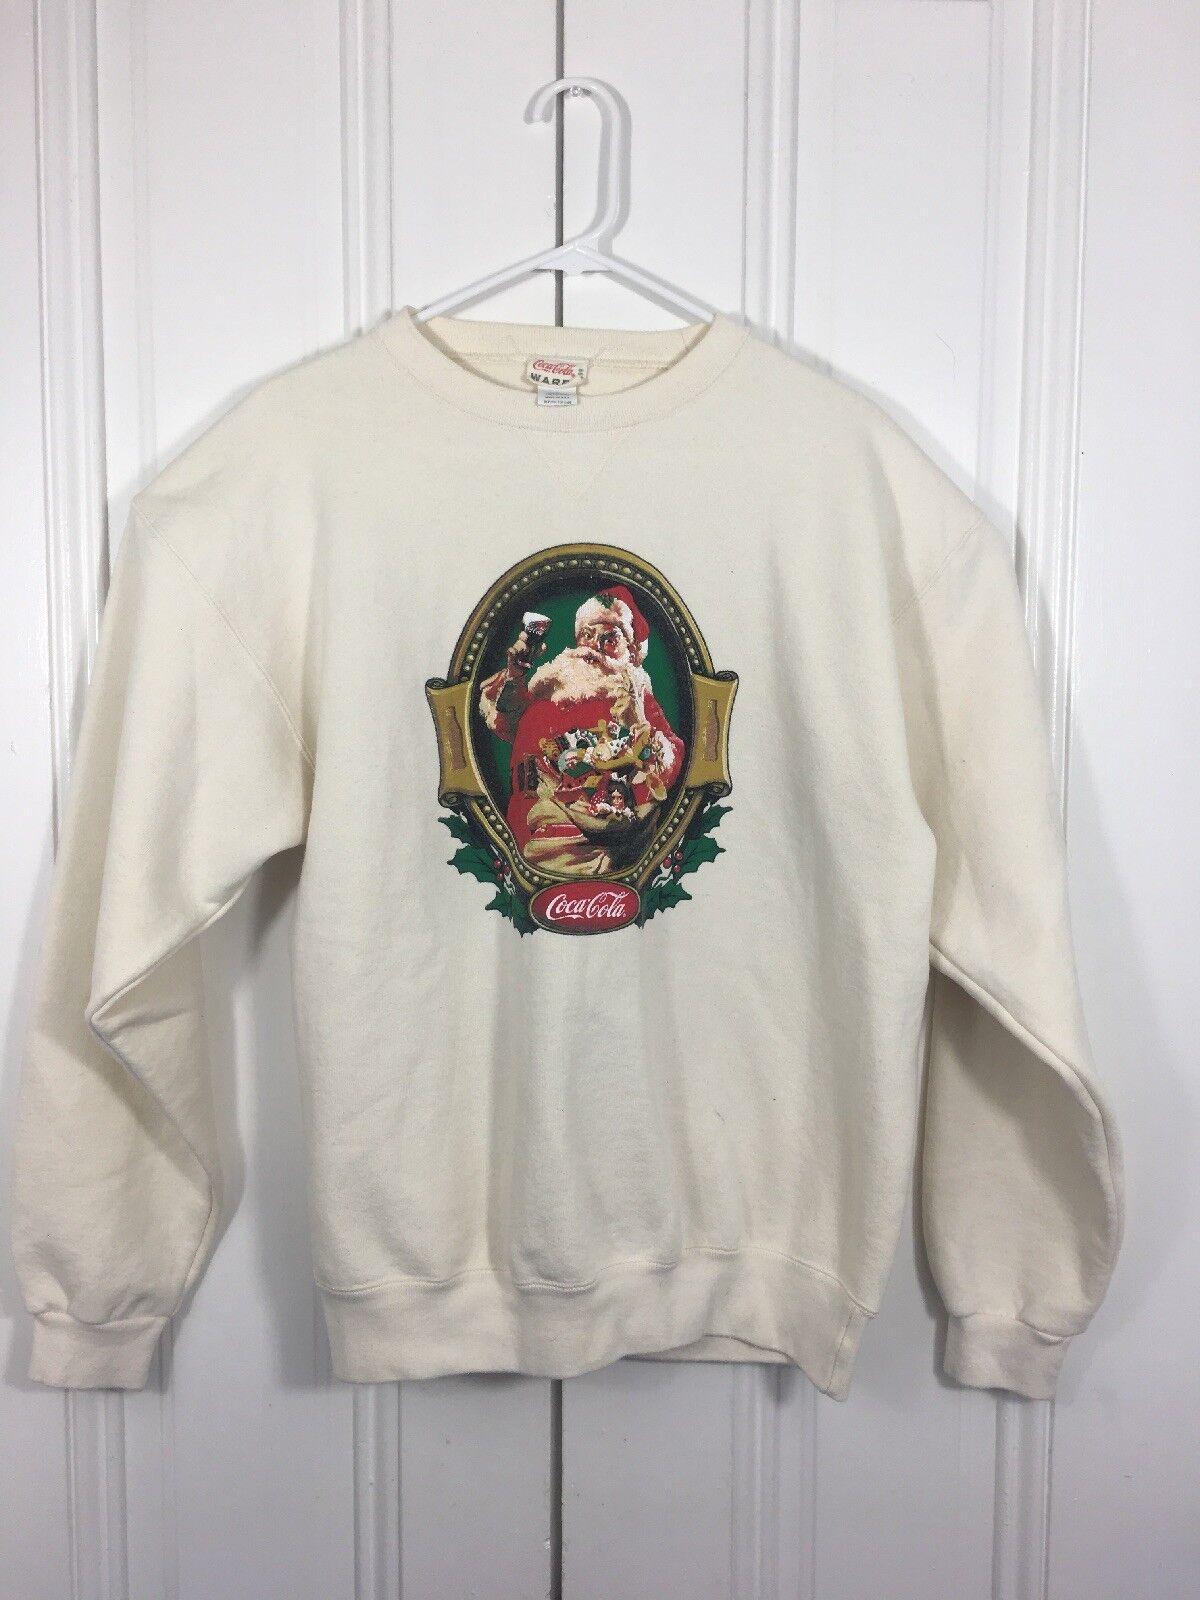 Coca Cola Ware Vintage 1999 Women's Large Christmas Sweater Classic Santa